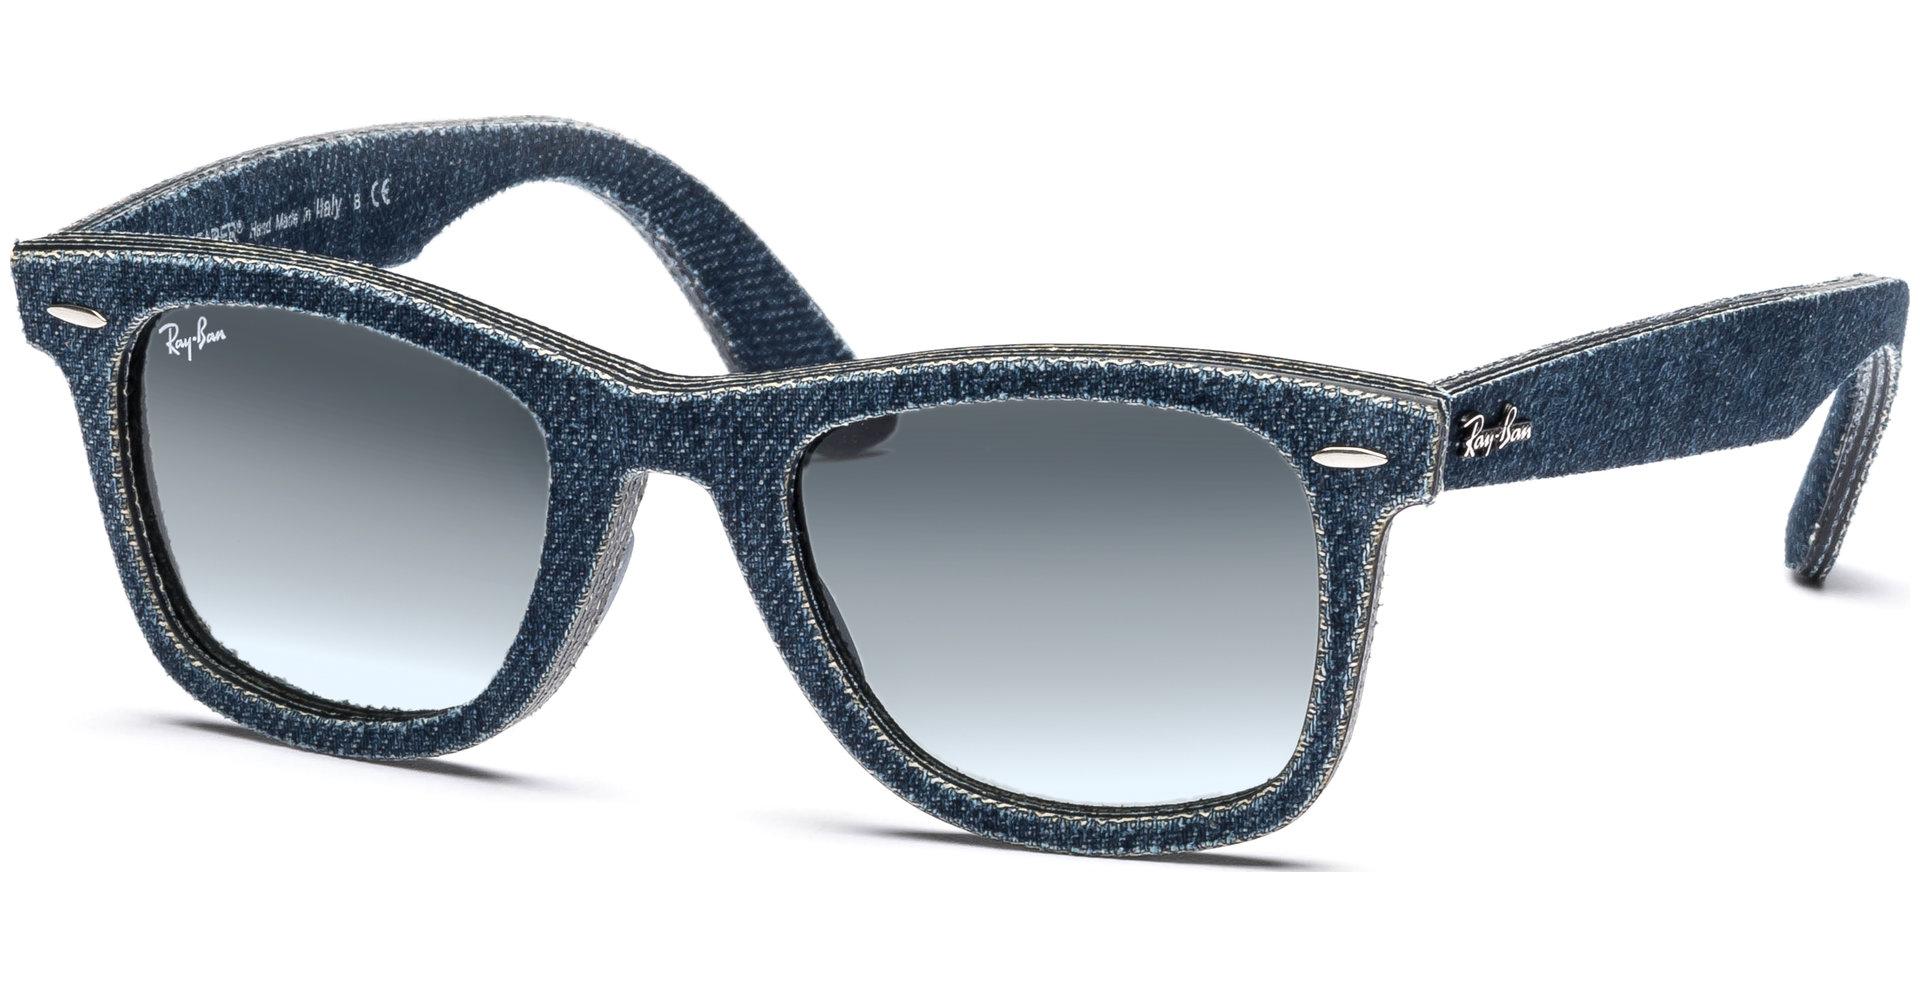 oculos ray ban rb4068 louisiana bucket brigade. Black Bedroom Furniture Sets. Home Design Ideas